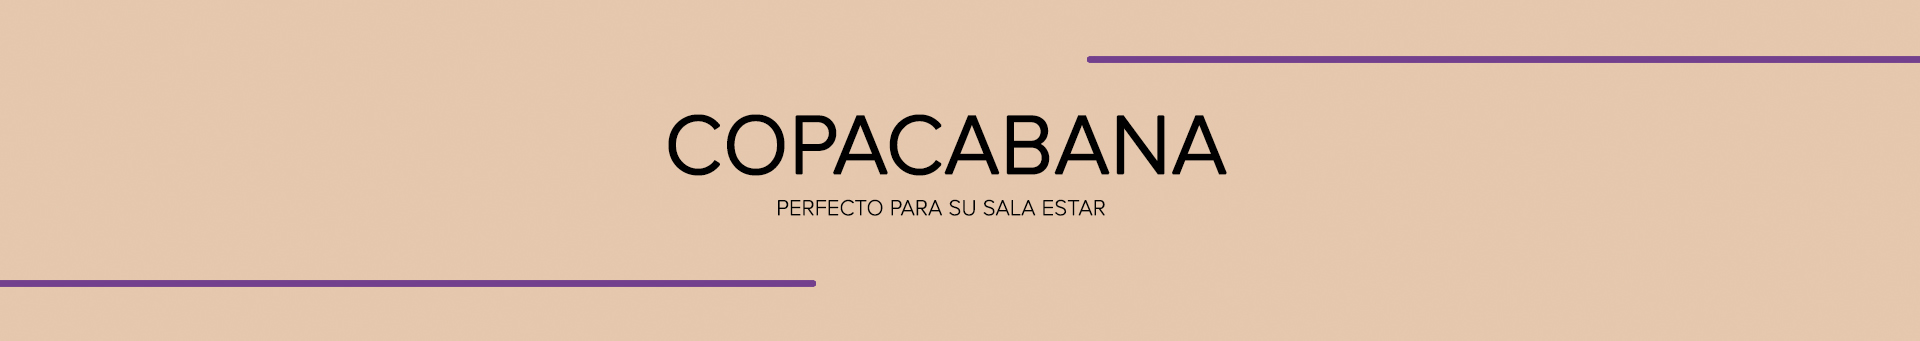 Centro de entretenimento Copacabana